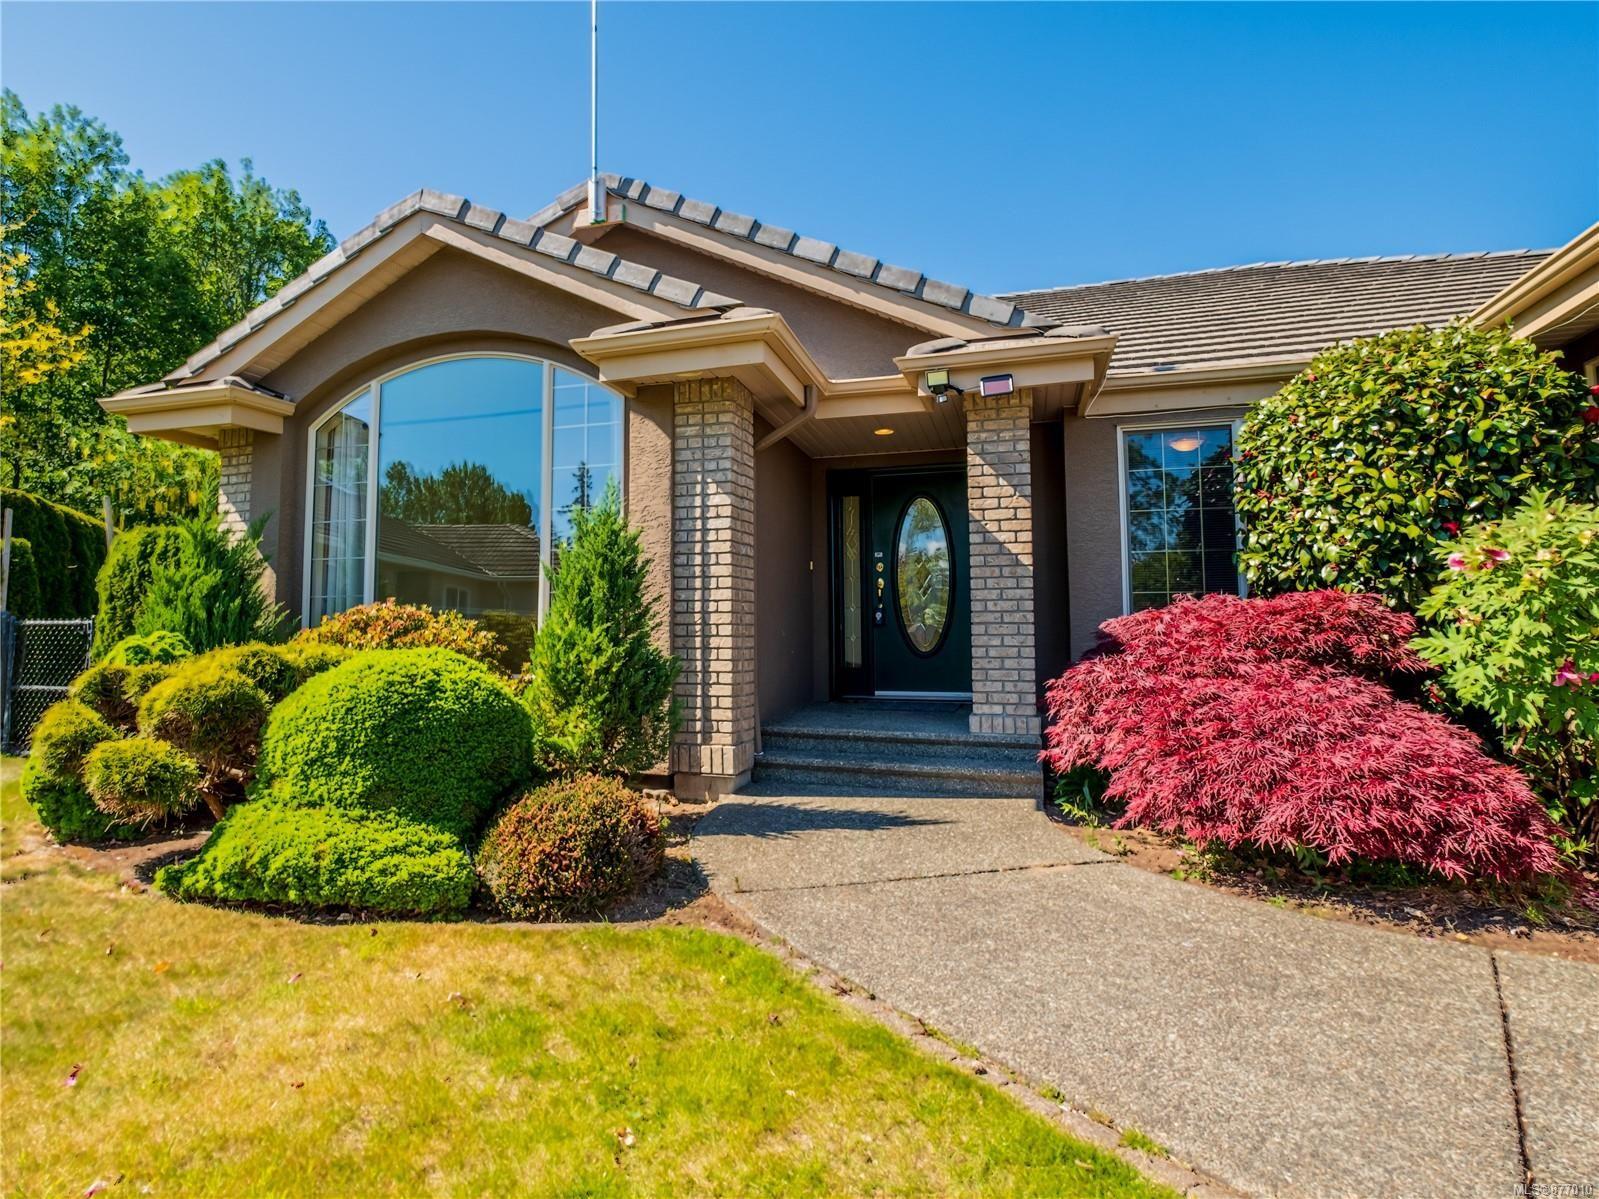 Main Photo: 778 Chartwest Crt in : PQ Qualicum Beach House for sale (Parksville/Qualicum)  : MLS®# 877010